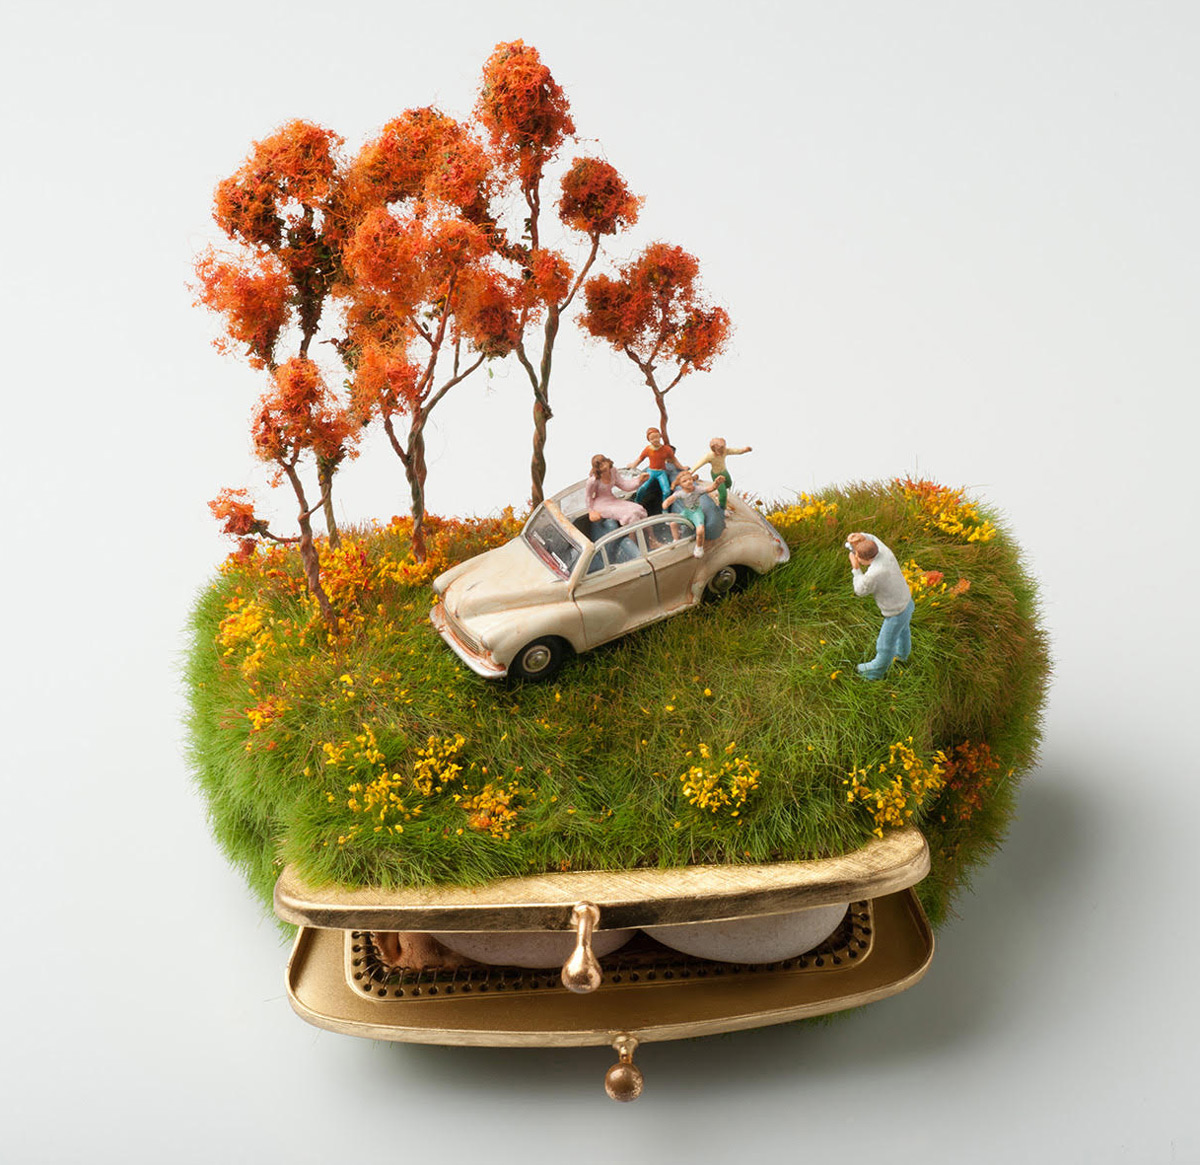 kendal-murray-miniatur-szobrai-noko-01.jpg